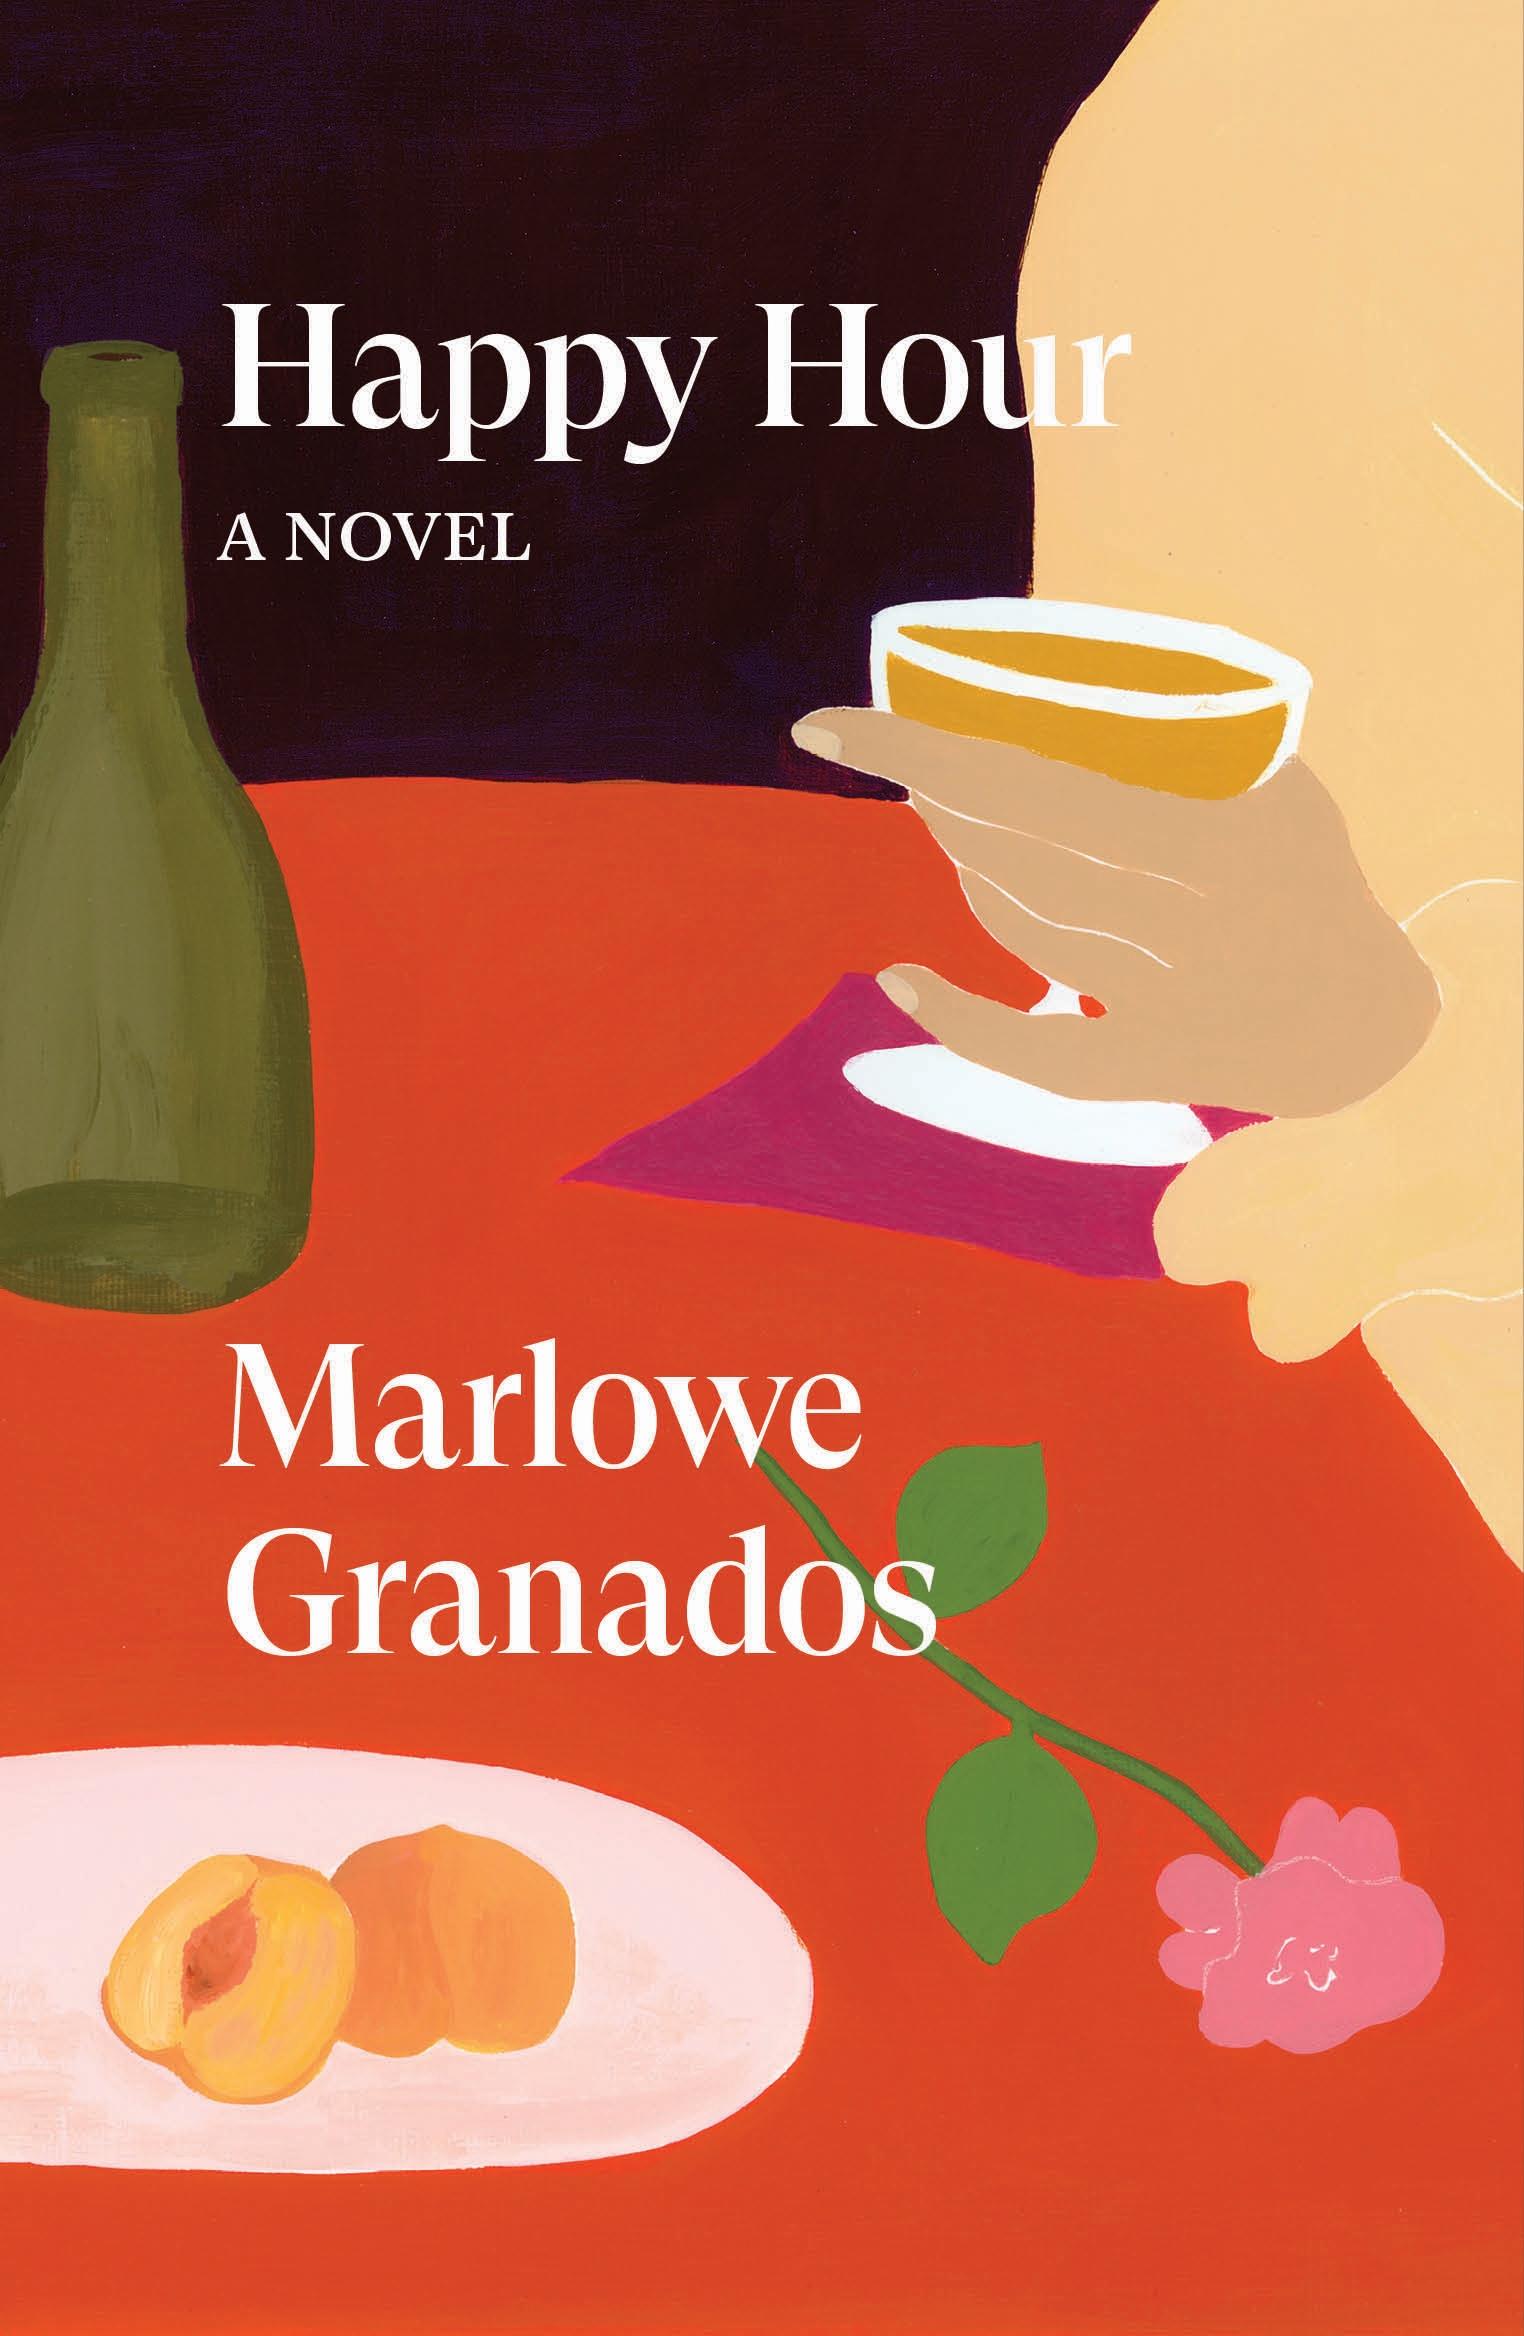 Book Launch: Happy Hour by Marlowe Granados in conversation with Rachel Tashjian